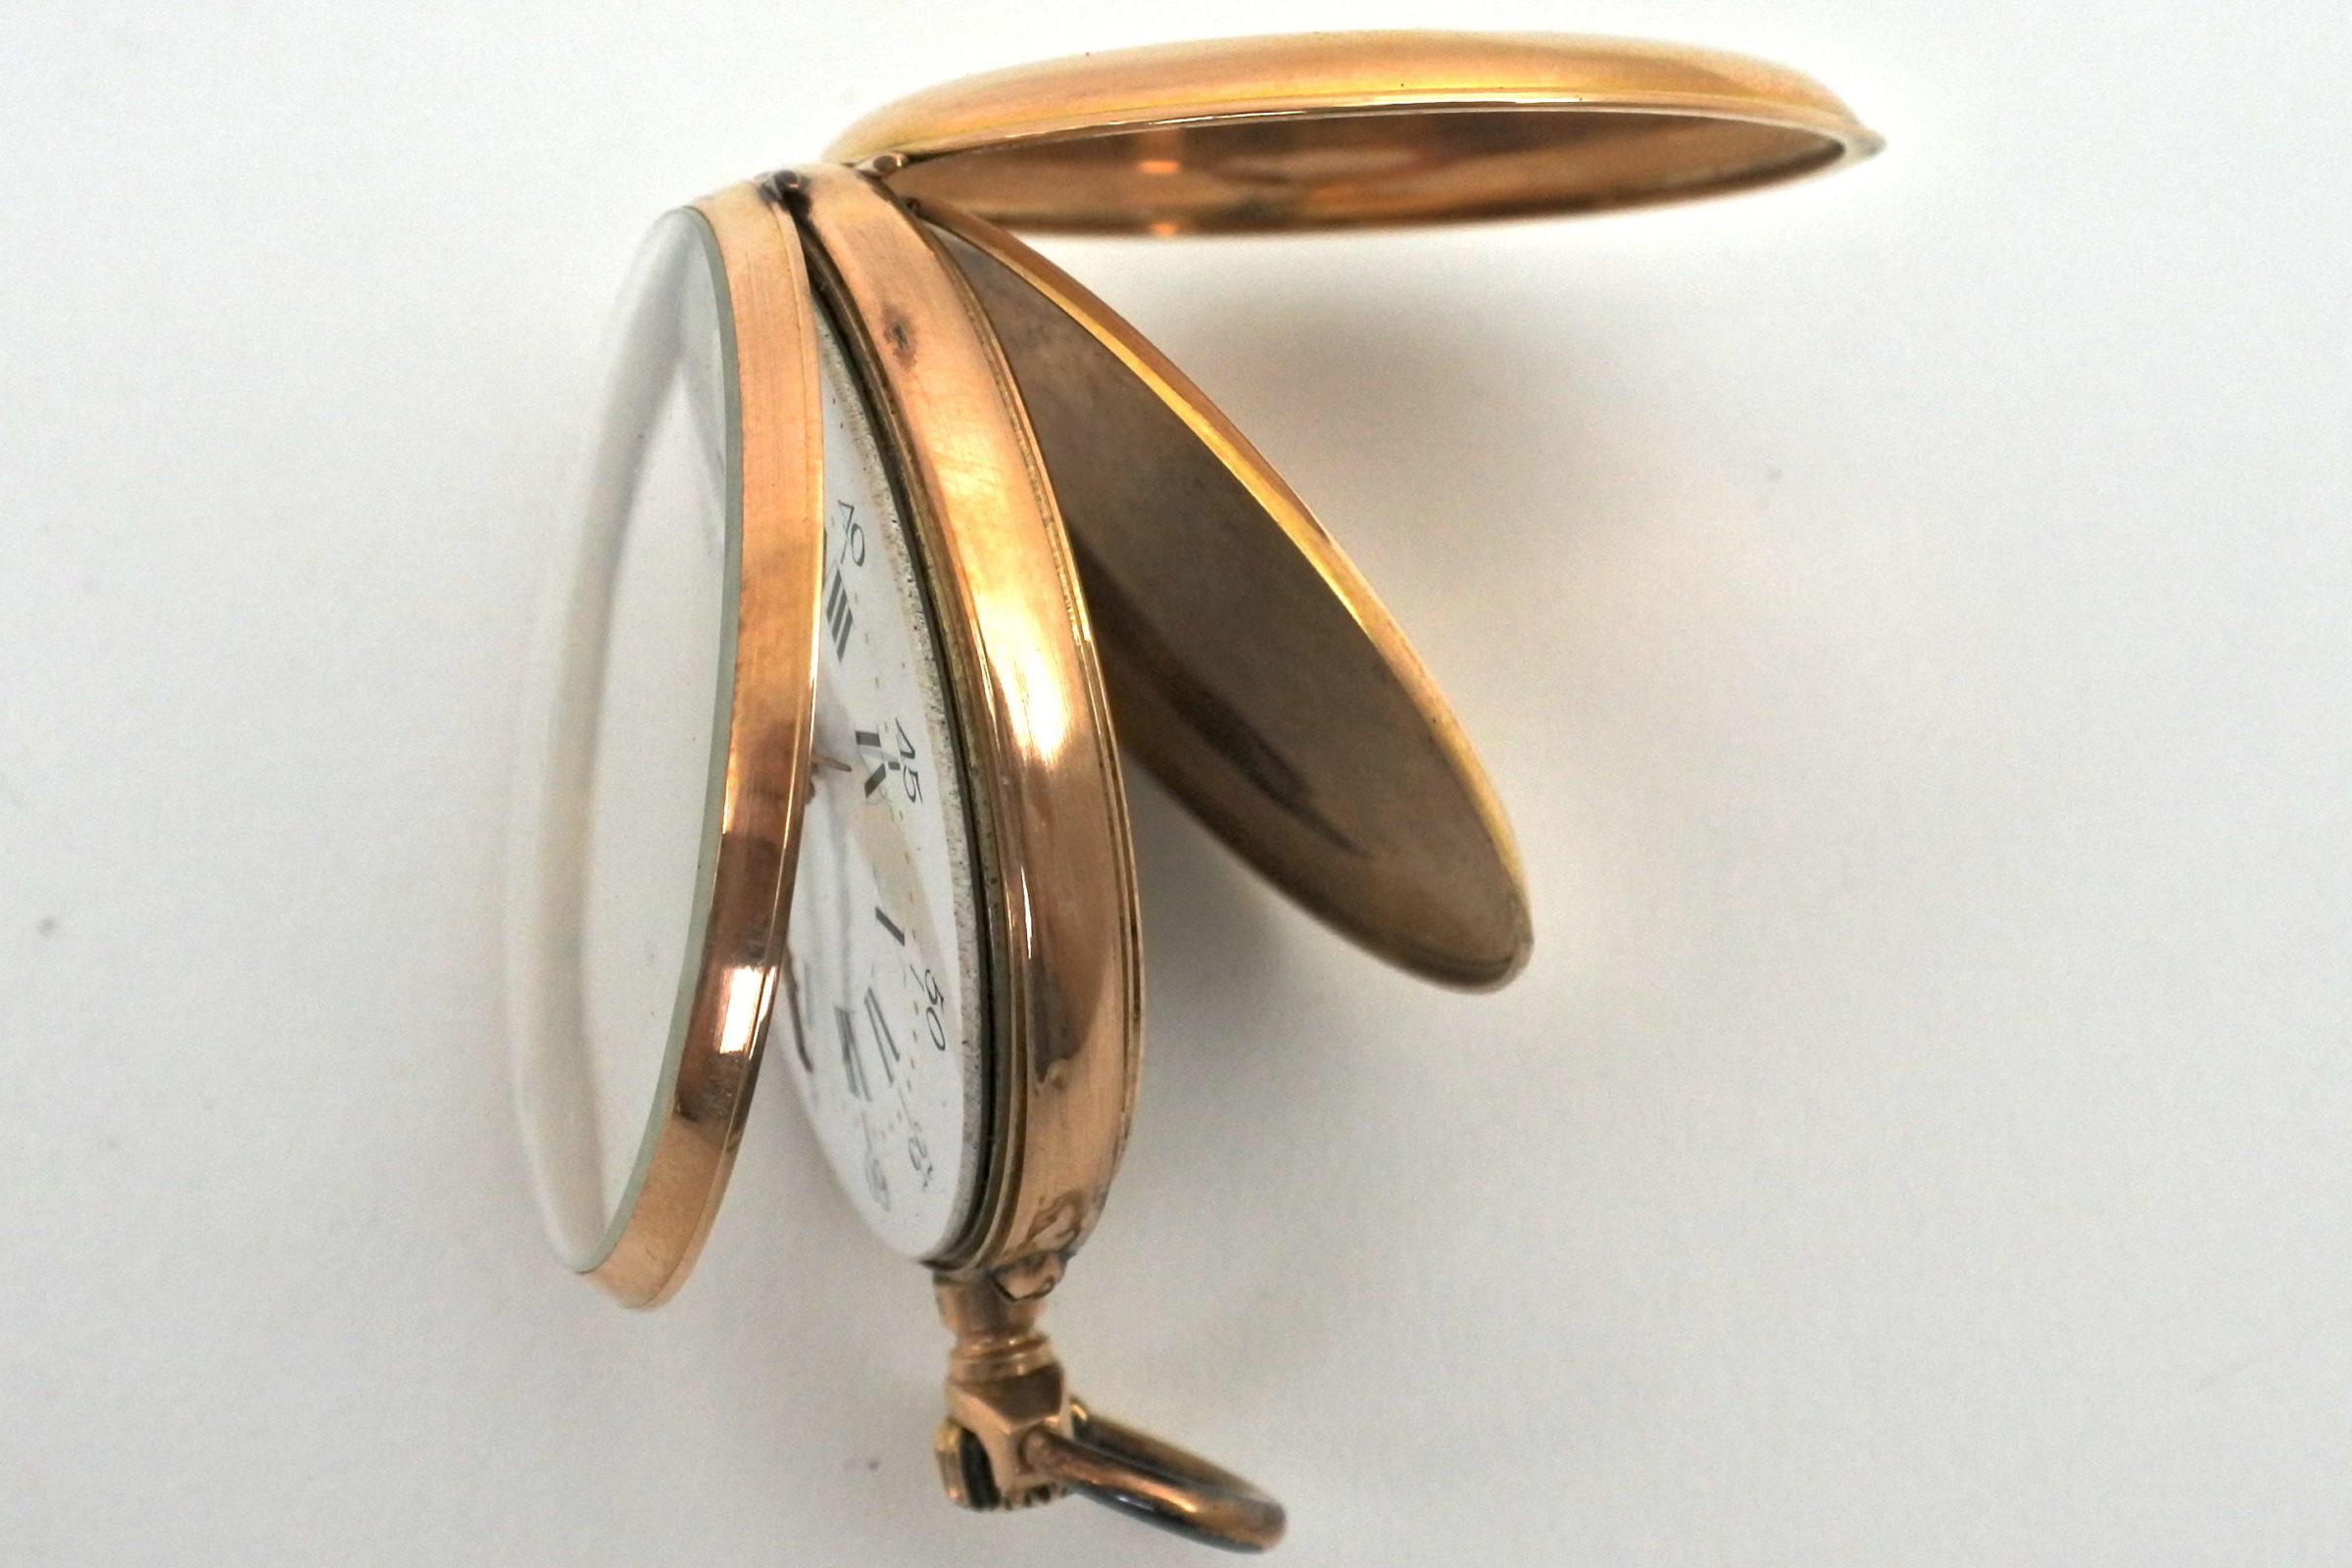 Orologio da tasca in oro - Octave Dupont - 6